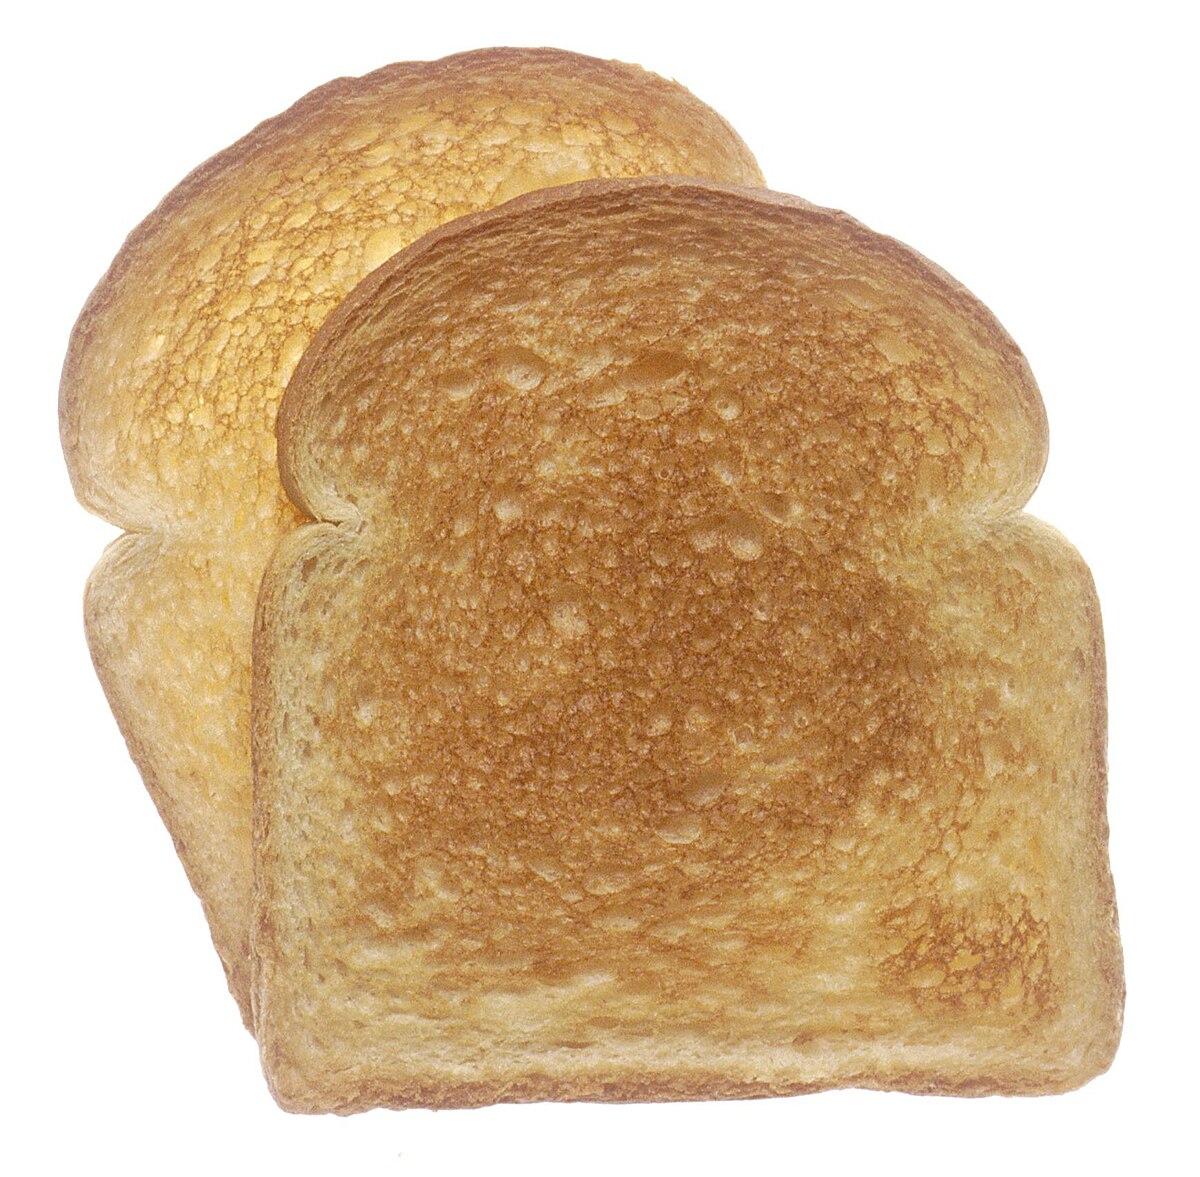 toast - Wiktionary